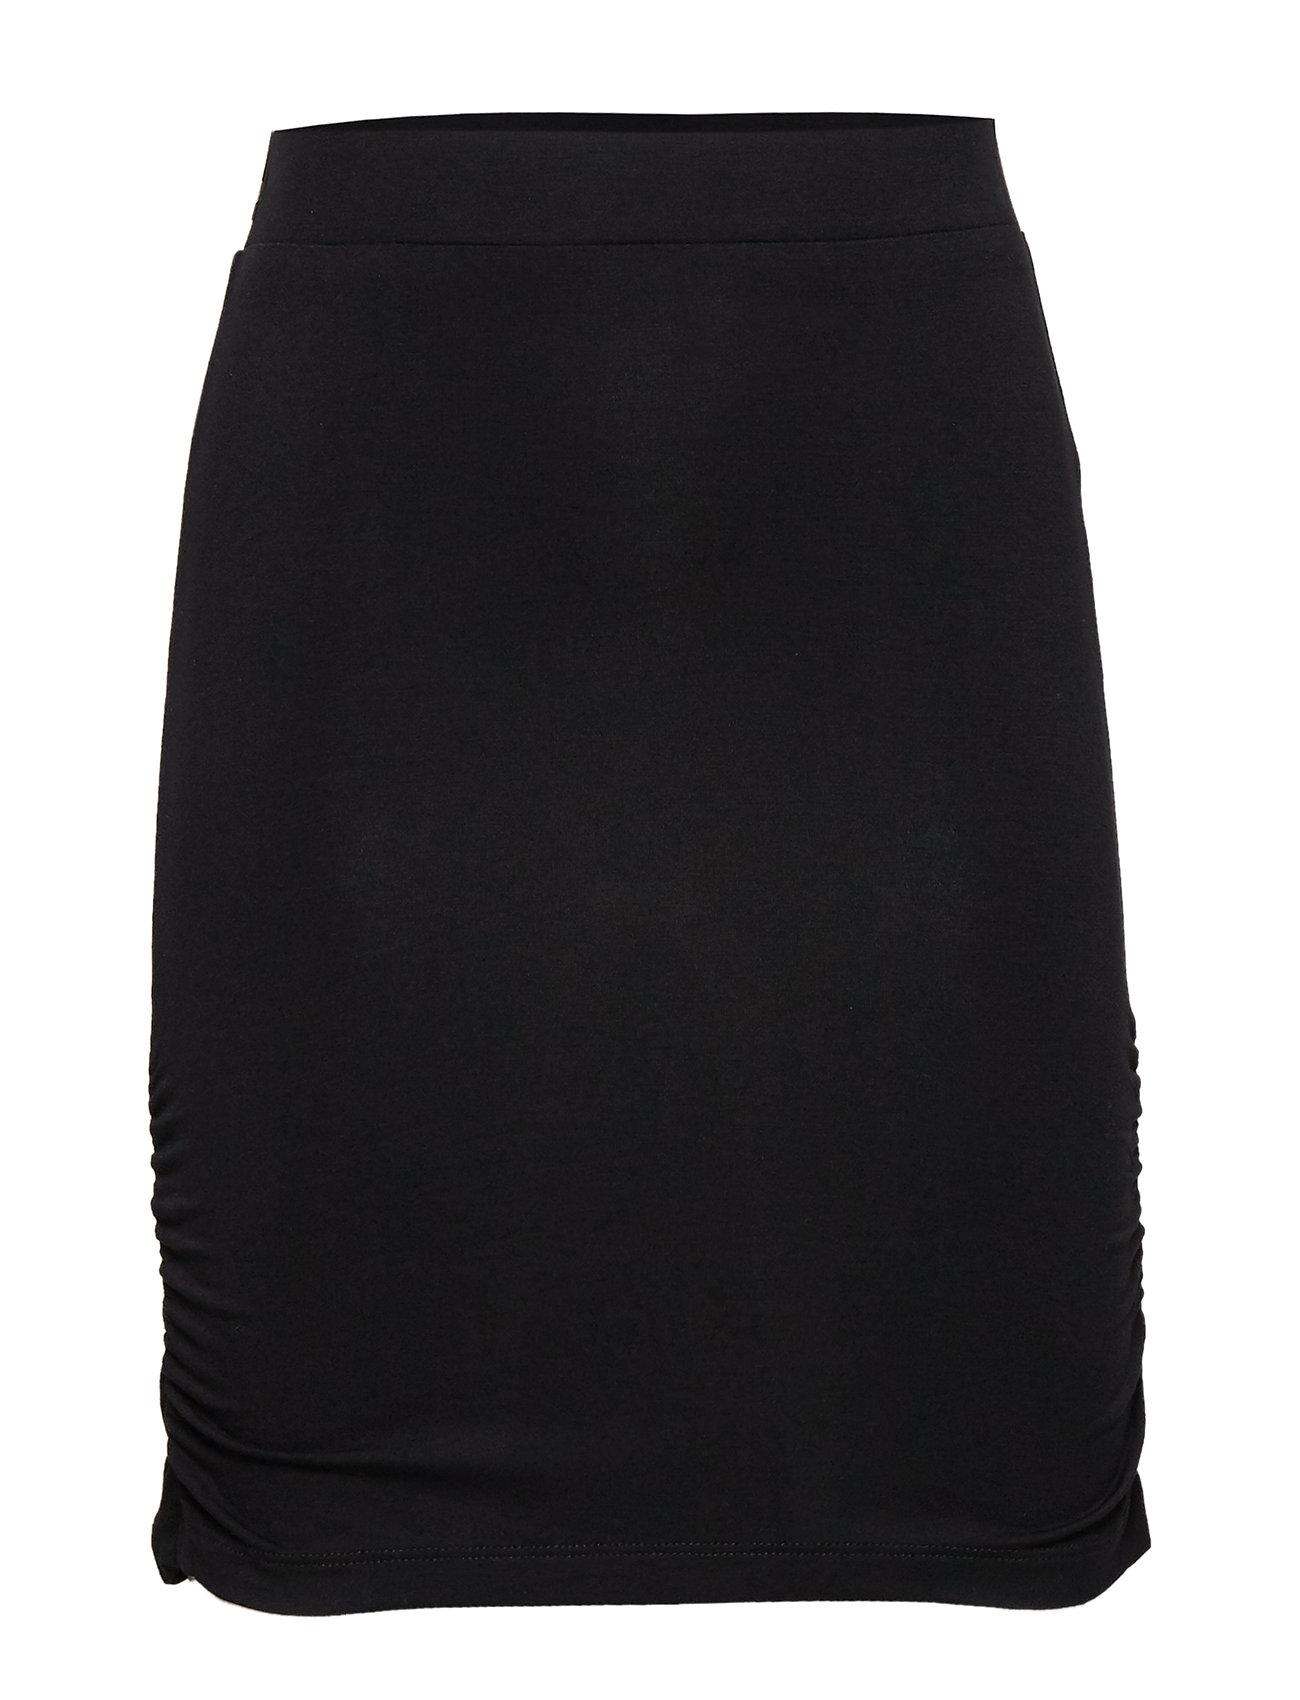 Image of Anuka Skirt Noos (3073373781)